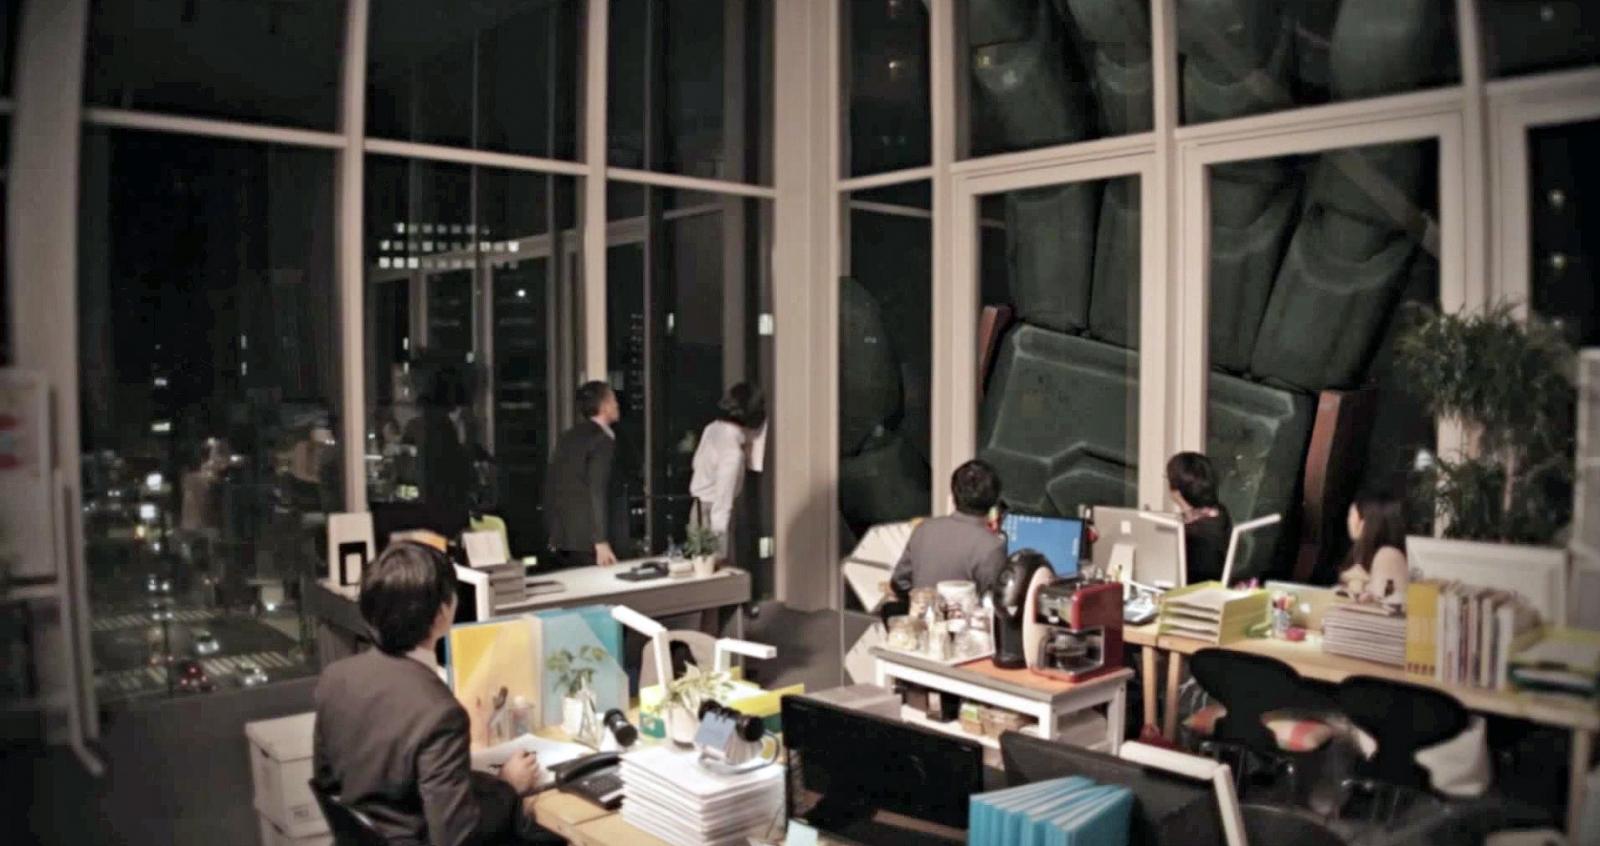 Mobile Suit Gundam Watch Japanese Office Workers Freak